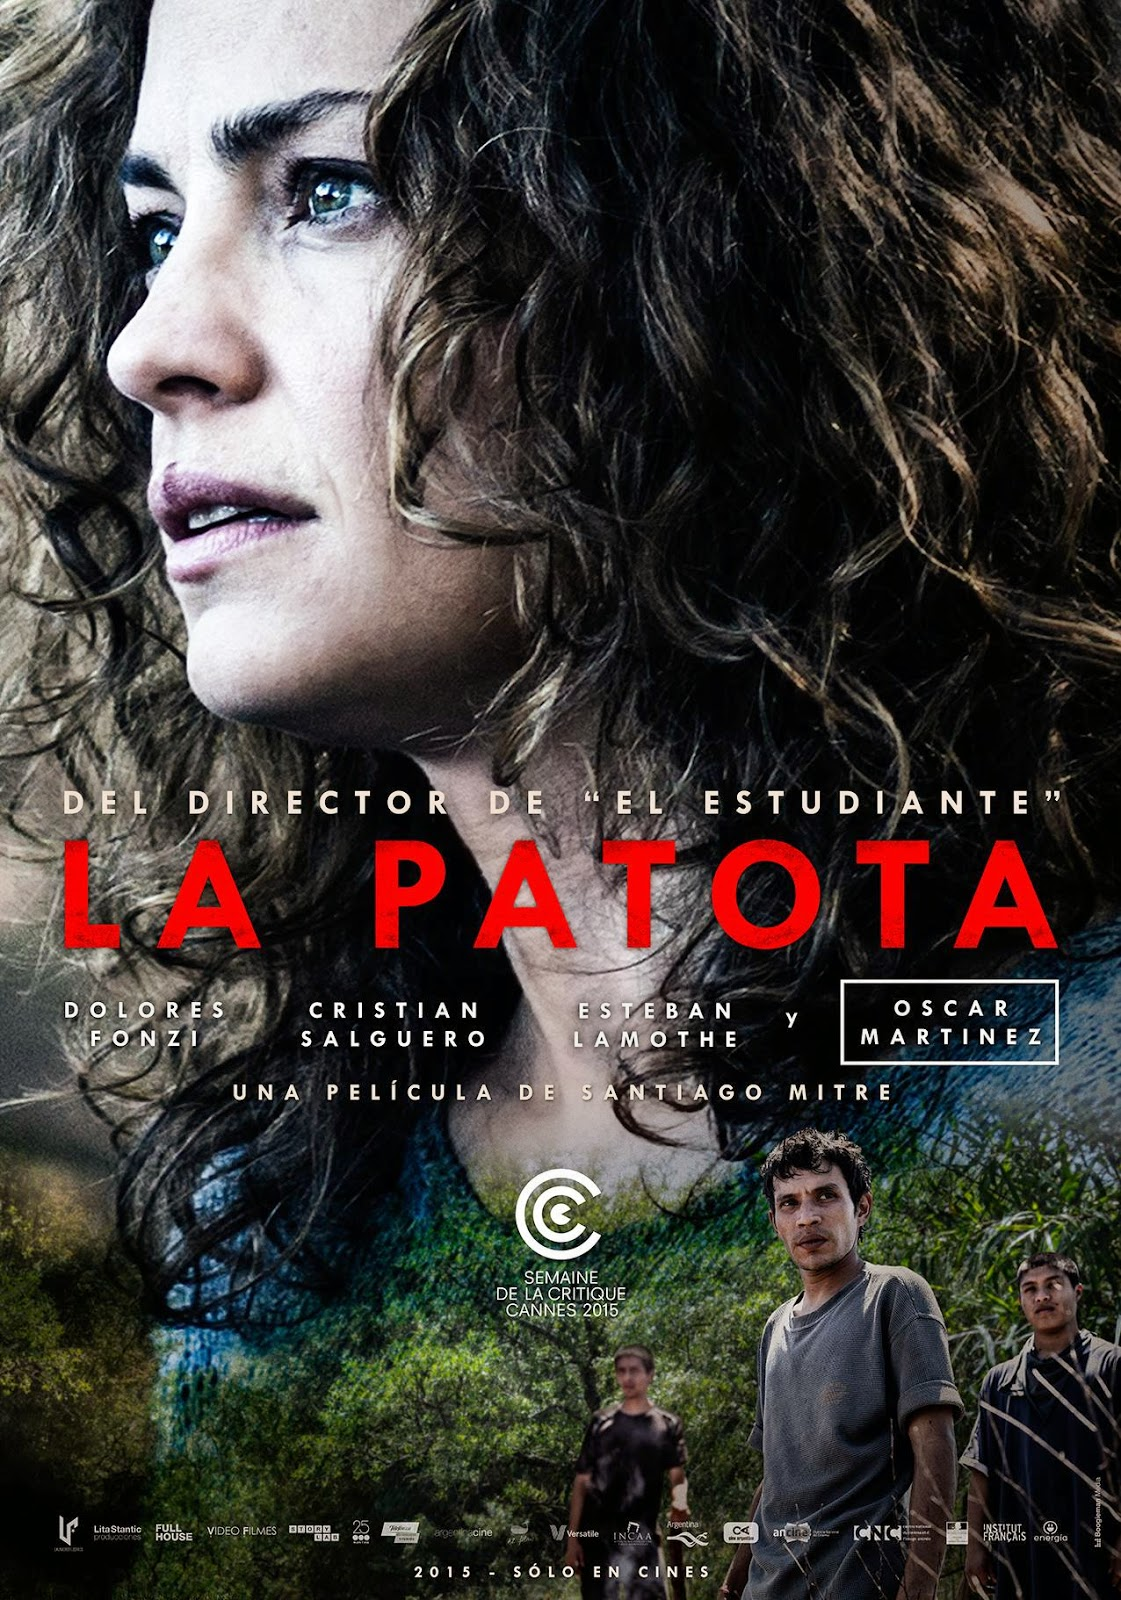 La Patota ganó el premio de la Semana de la Crítica del Festival de Cannes